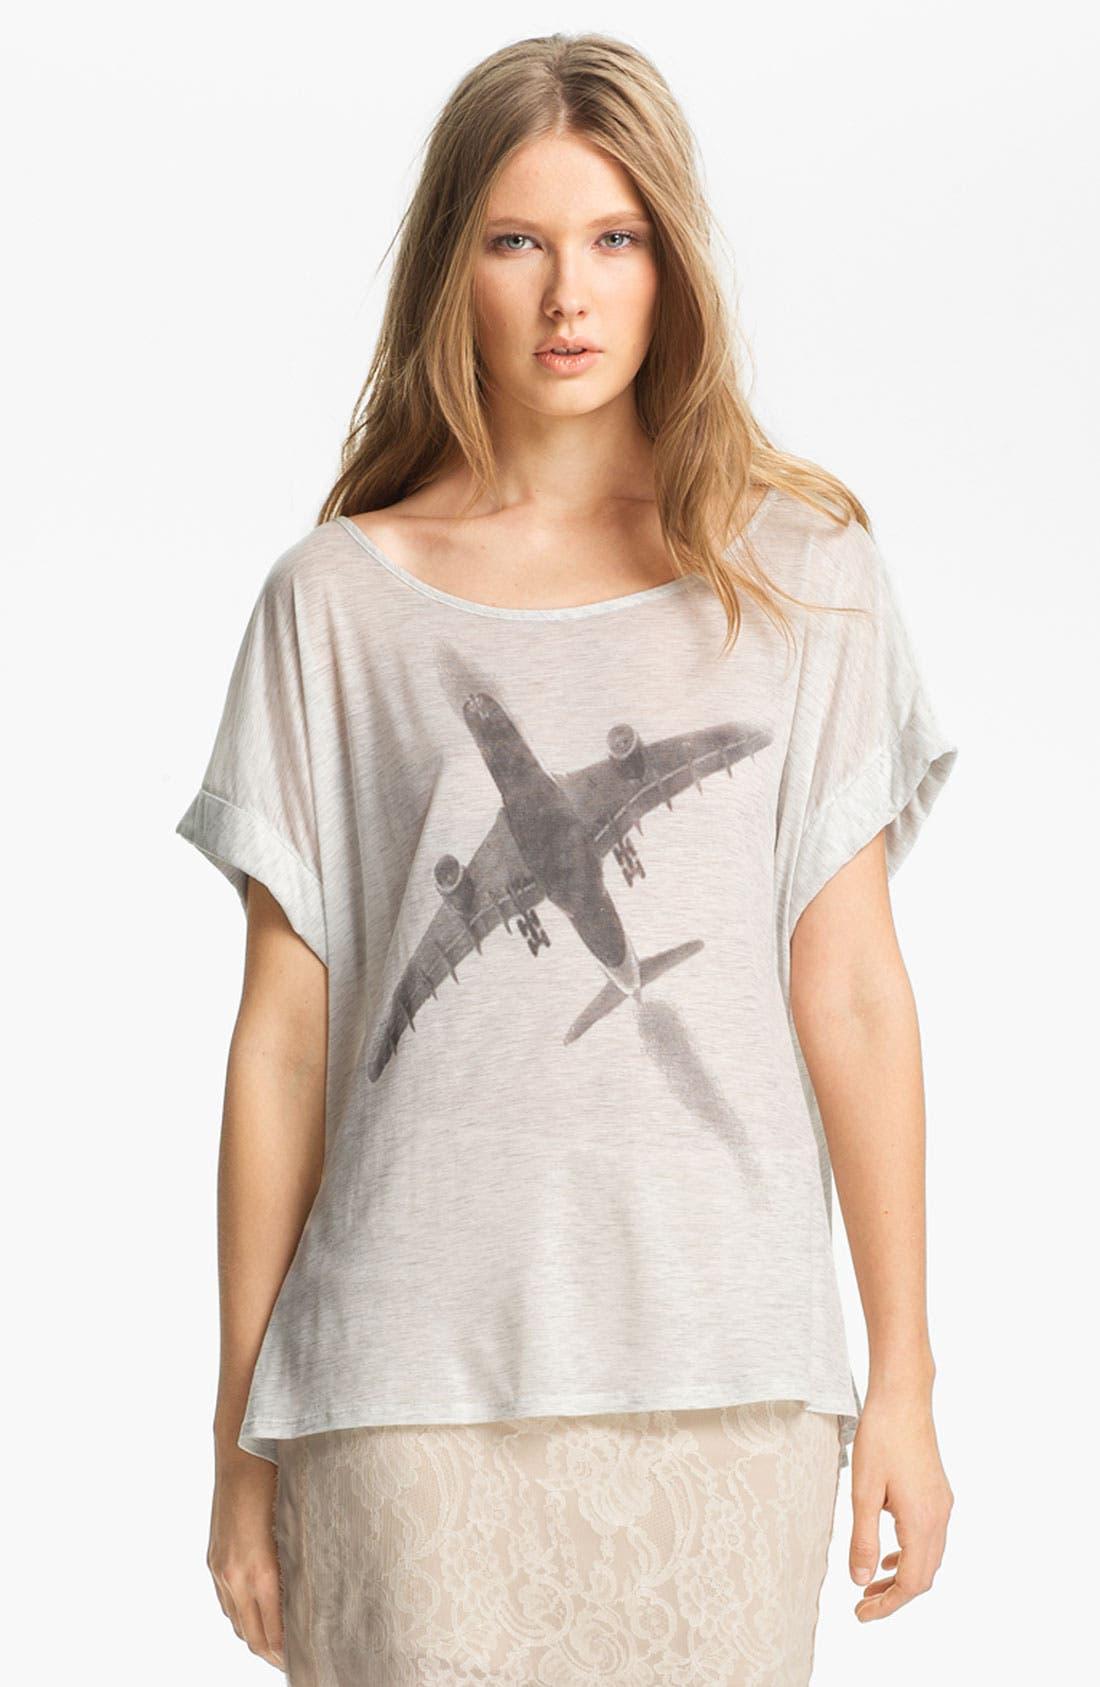 Main Image - Haute Hippie 'Fly Away' Jersey Tee